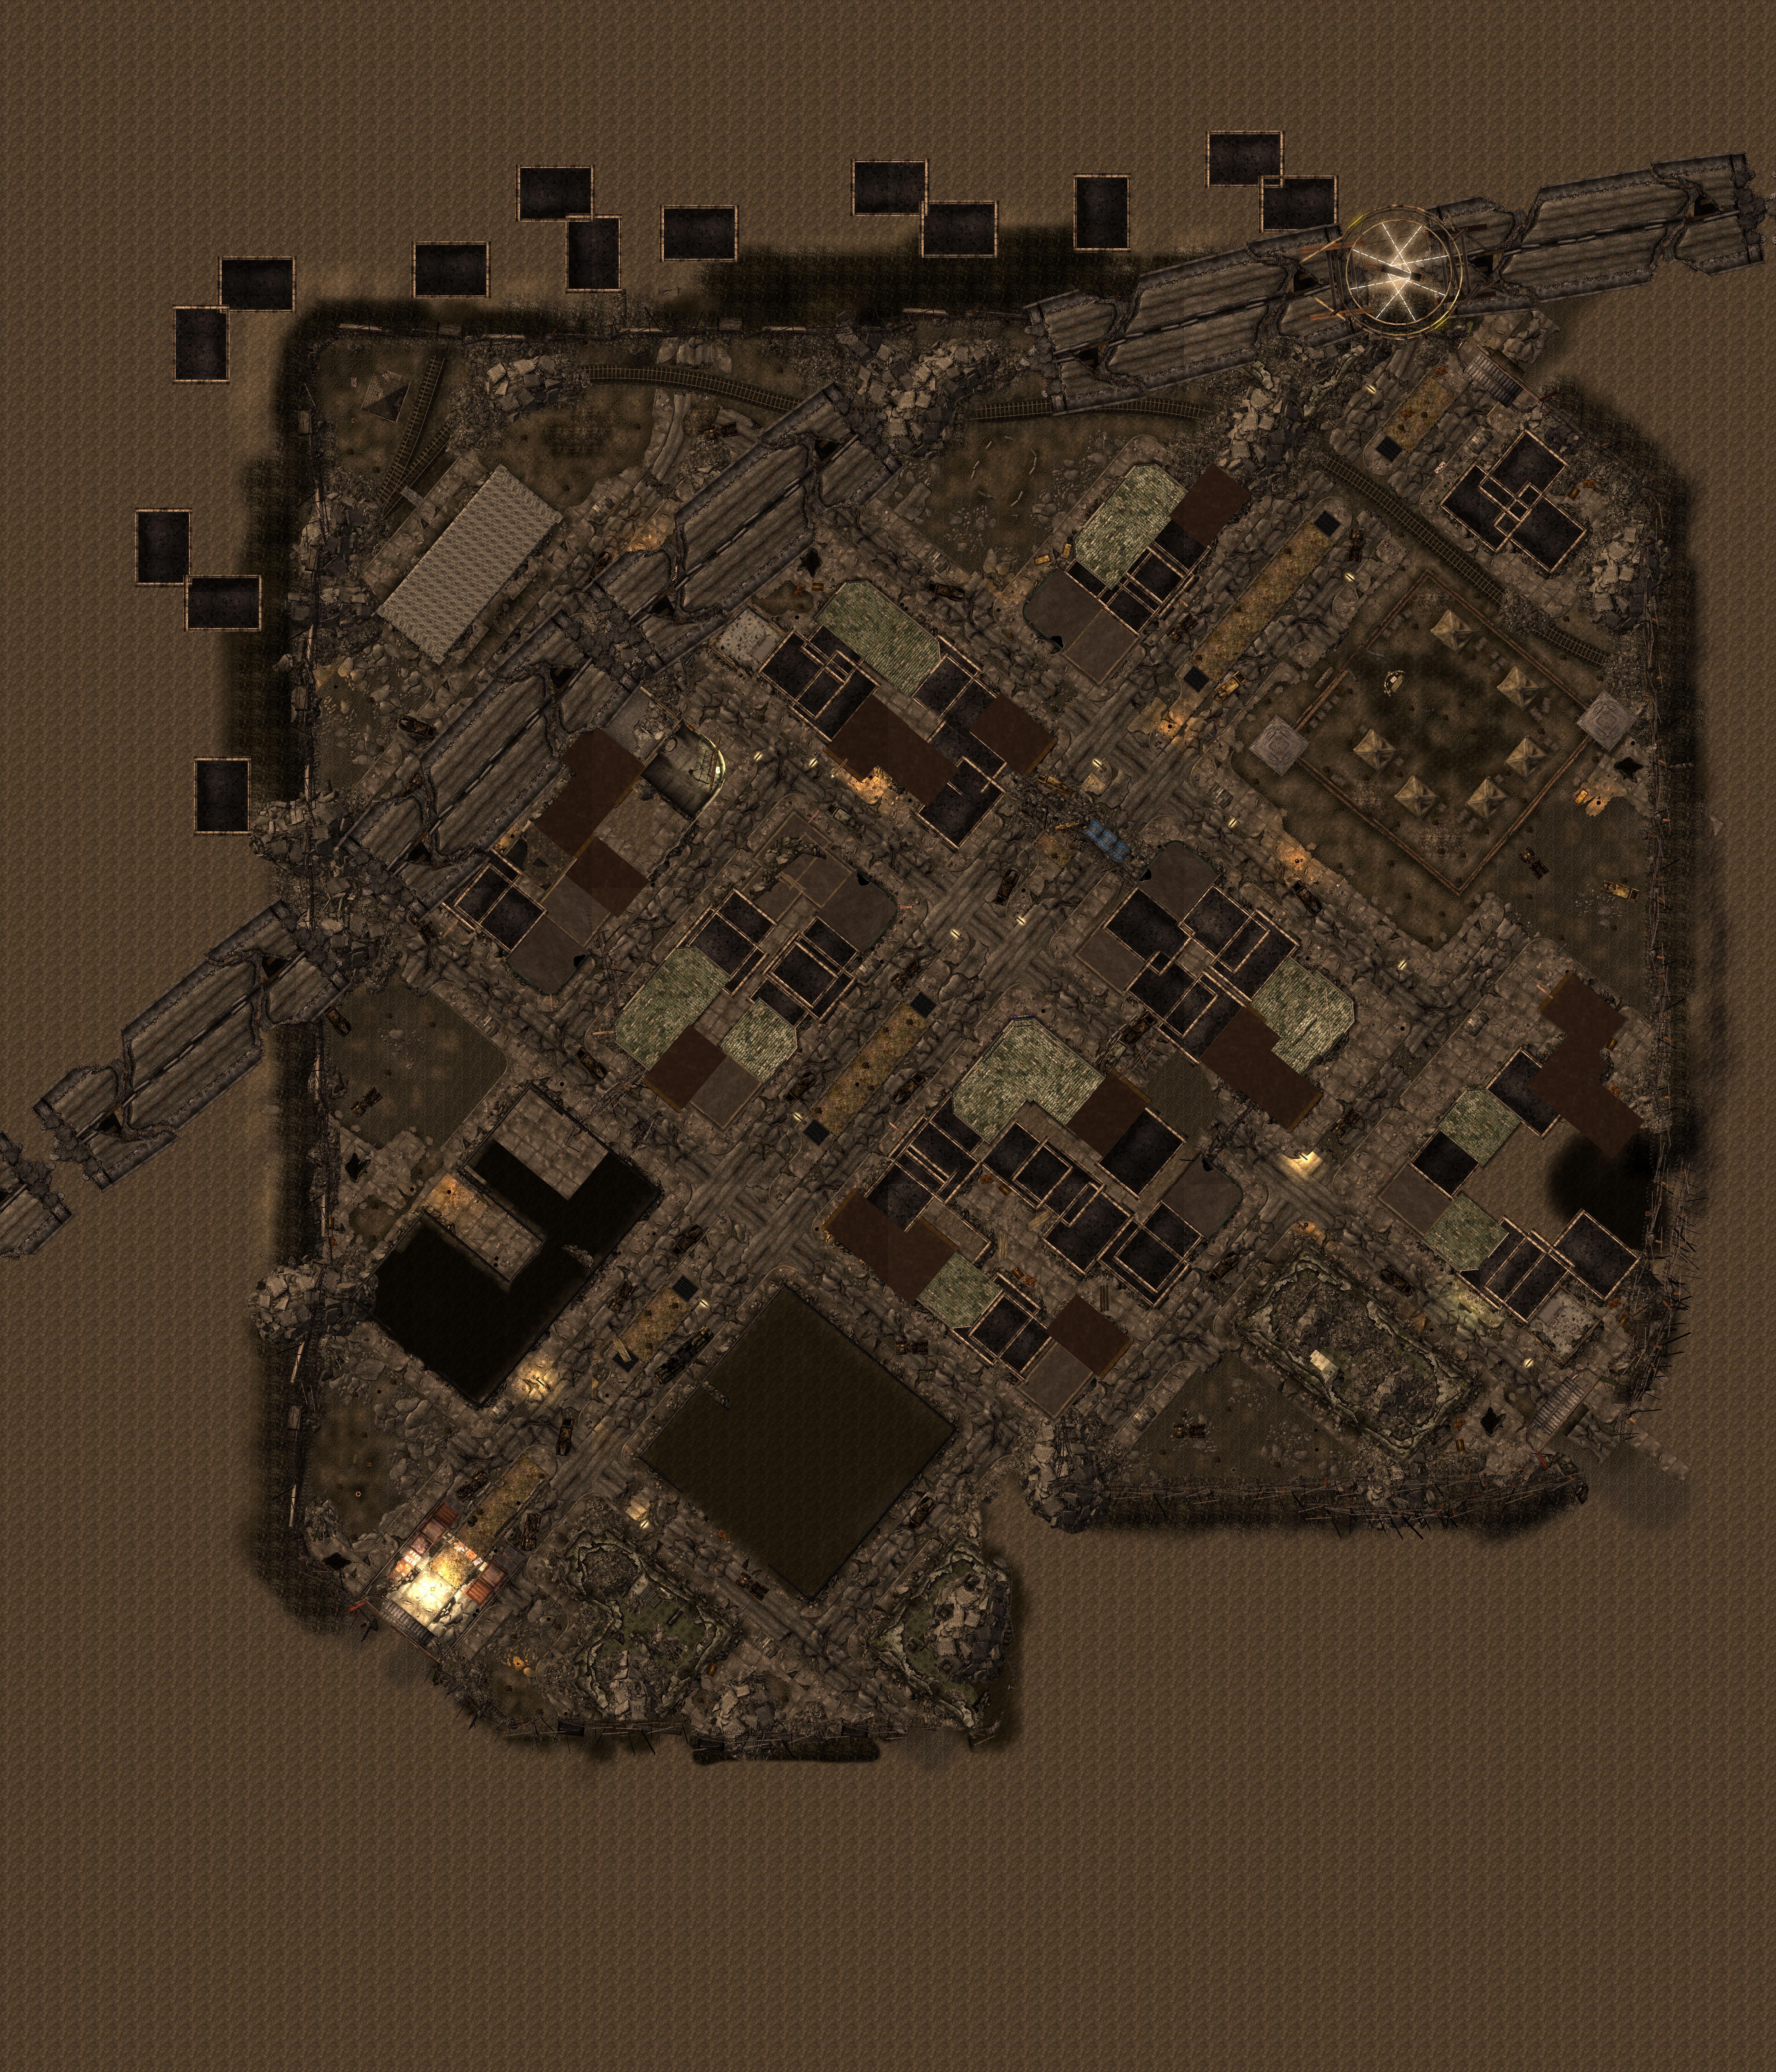 FNV Freeside map